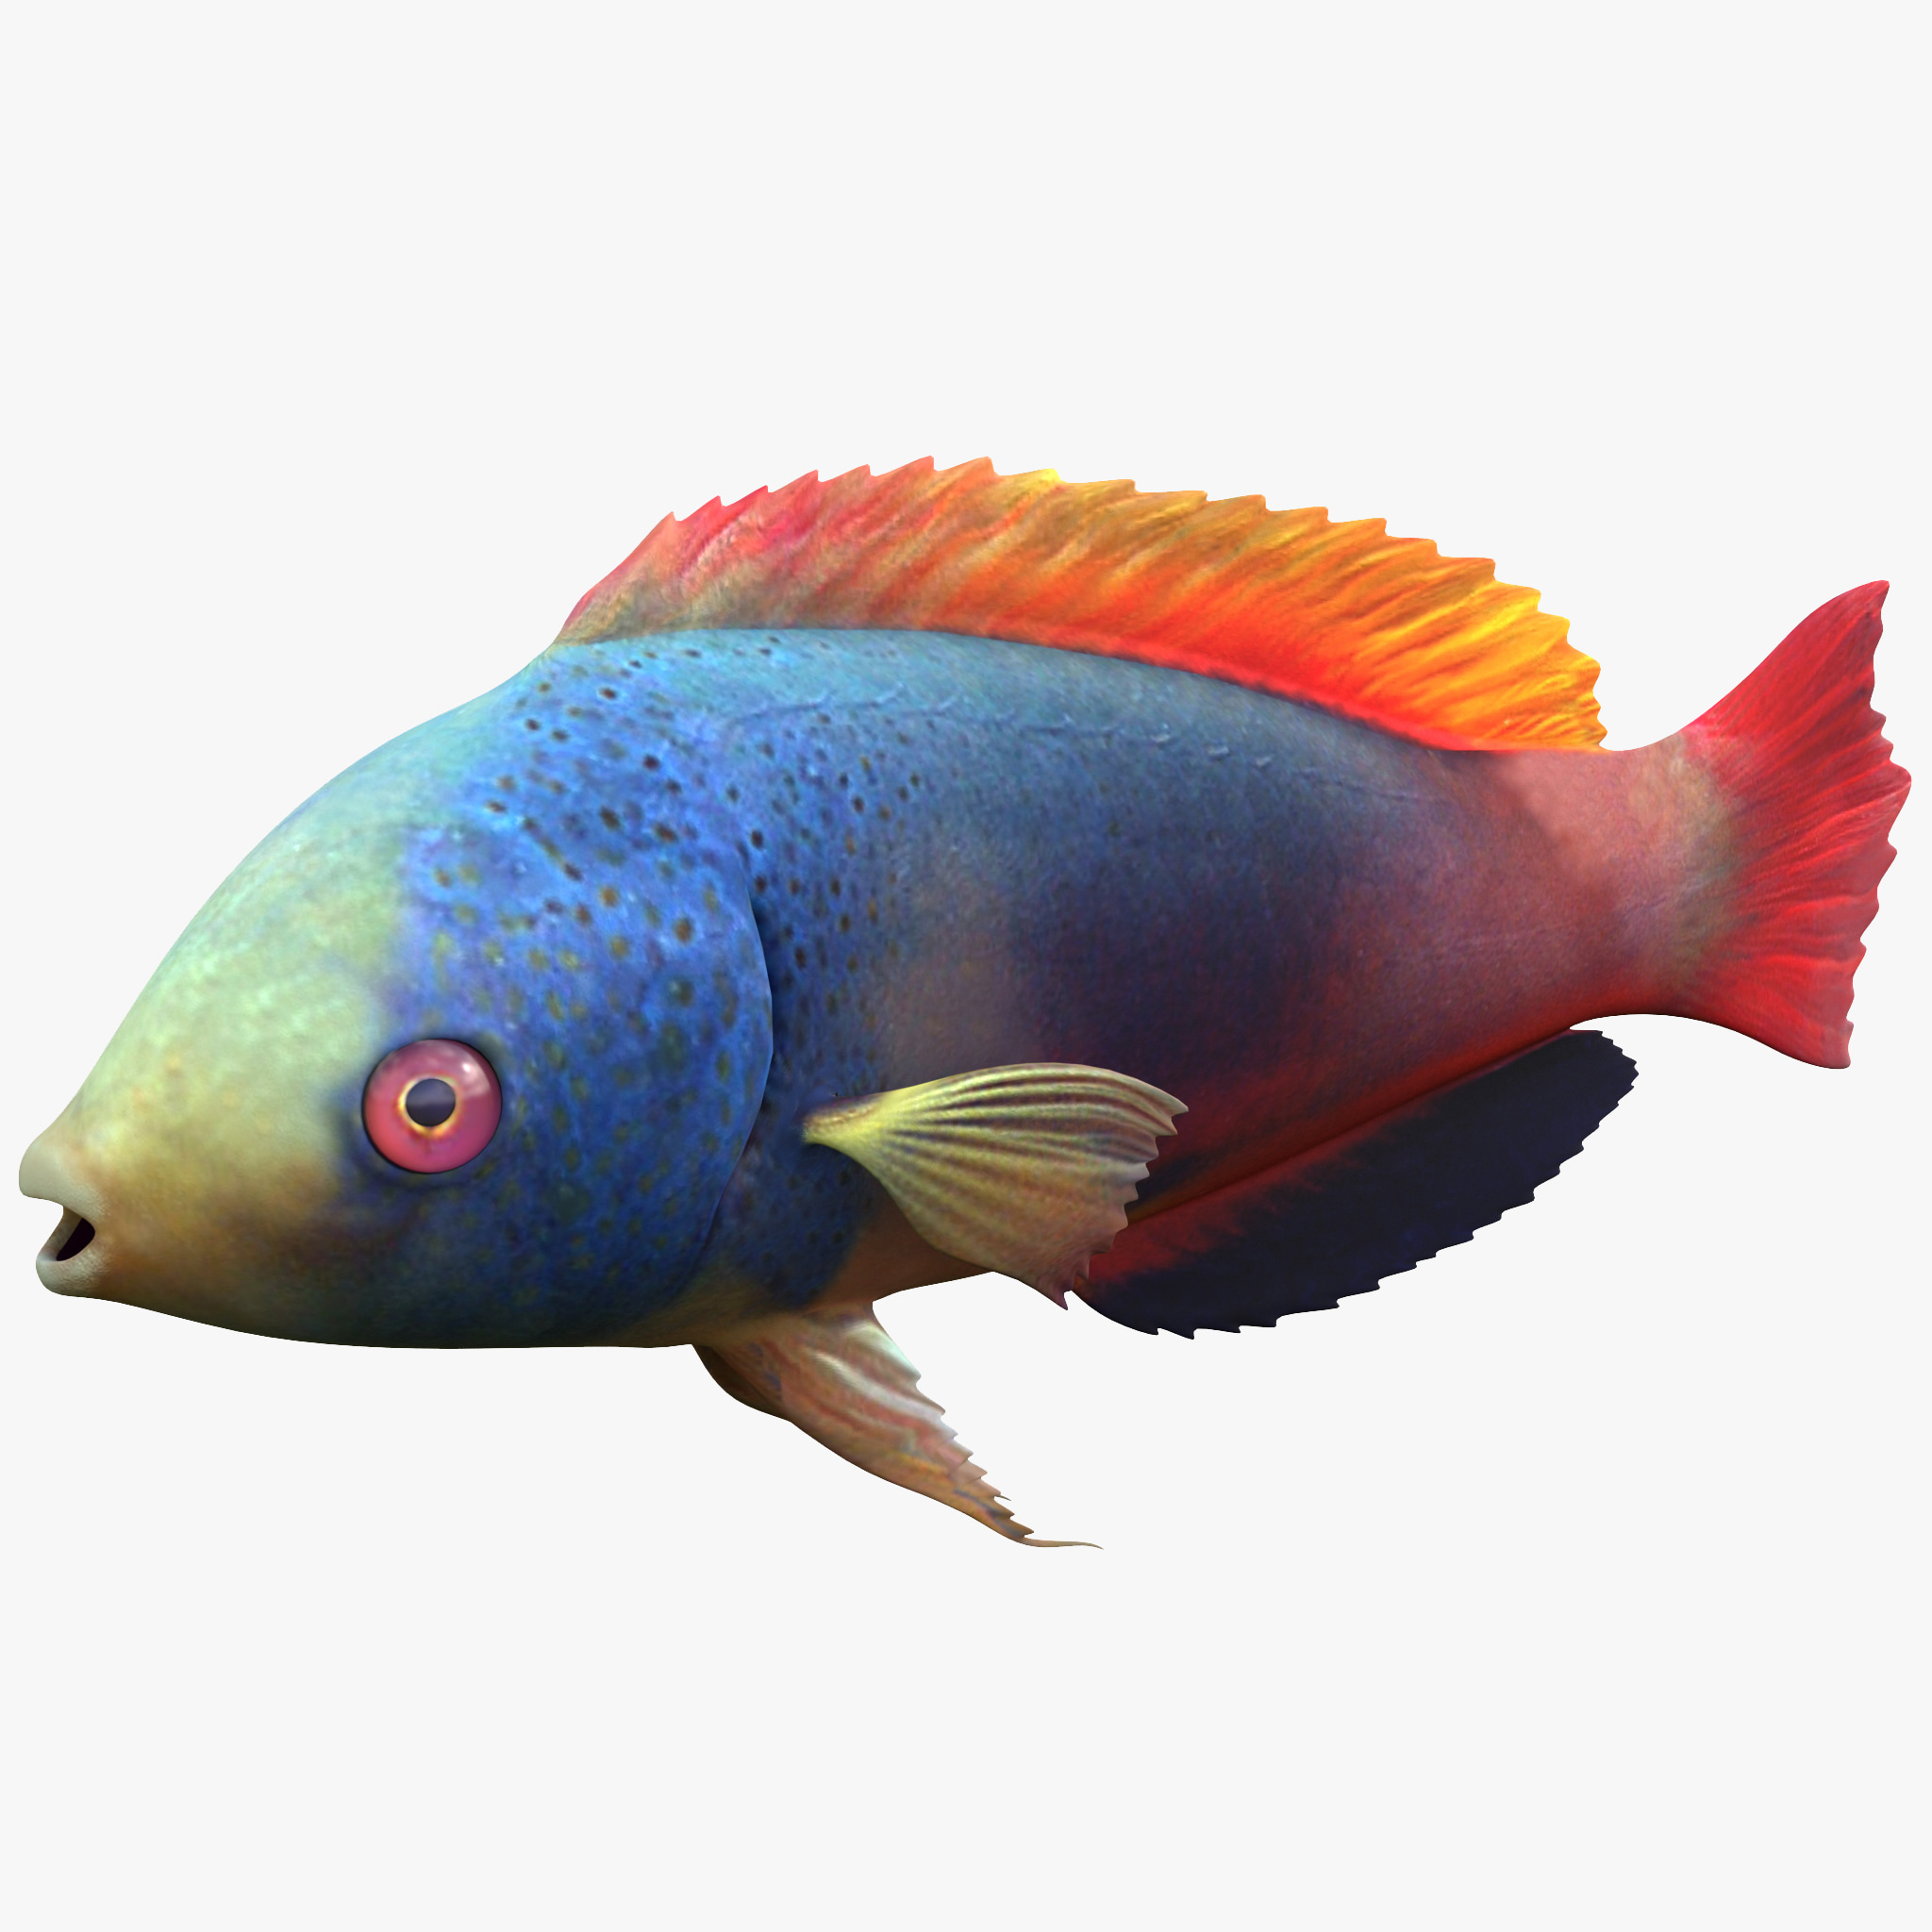 612265_Wrasse_Fish_000_1.jpg